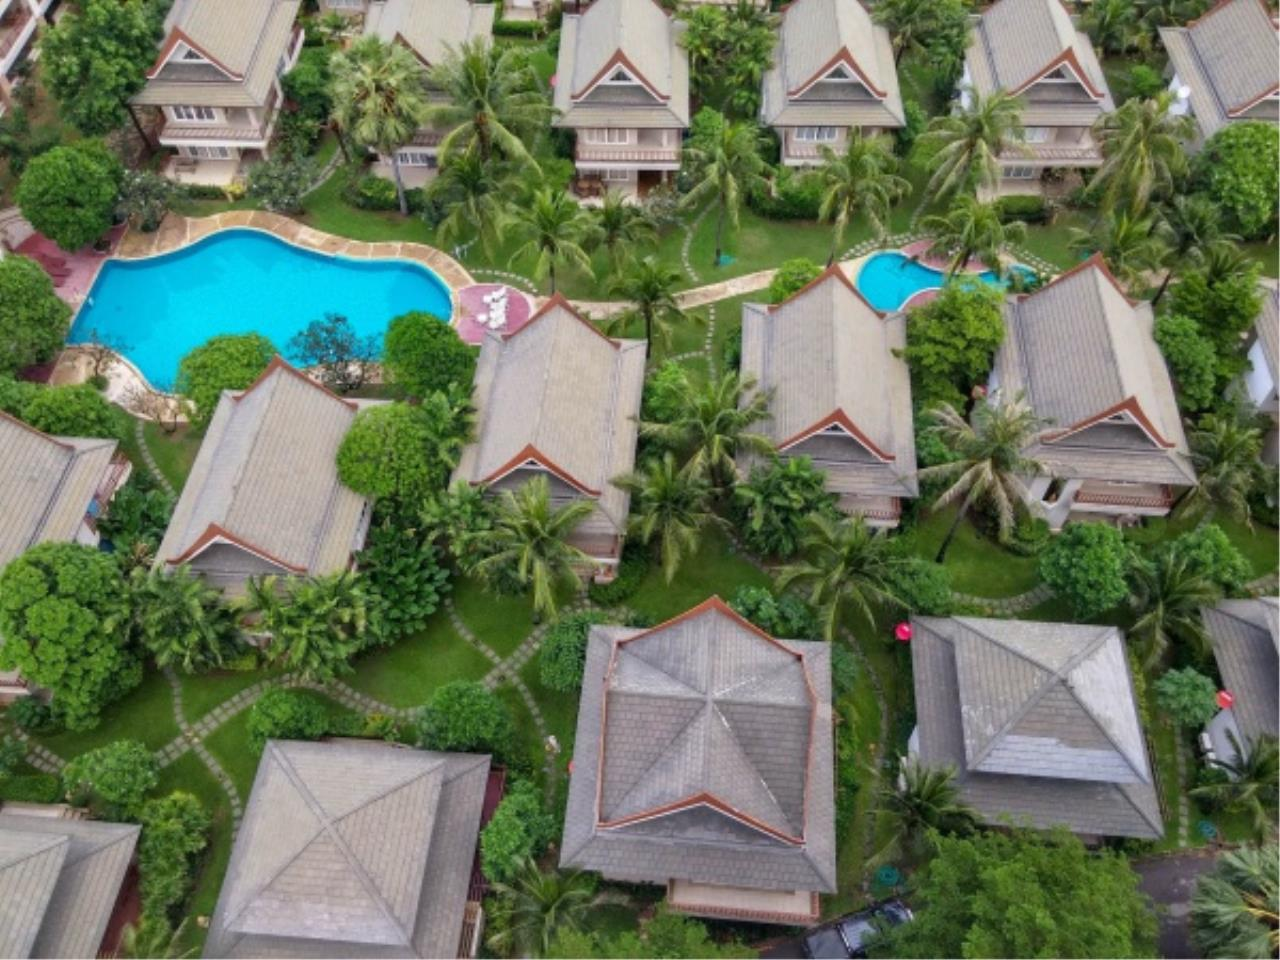 Agent - Aditep Pramorntat Agency's Fire Sell: Baan Talay Samran Beach Villa at Cha-am beachfront, 3 story 4 Bedrooms 4 Bathroom, Foreigner can own 15